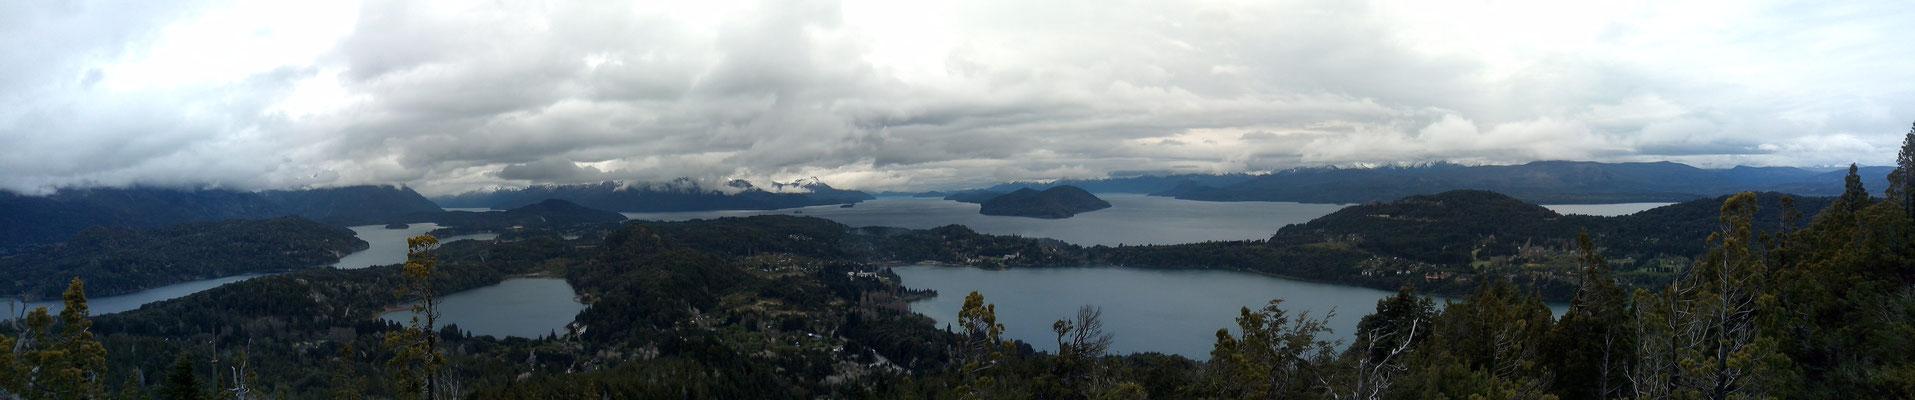 Vue sur les fjiords depuis le Cerro Campanario